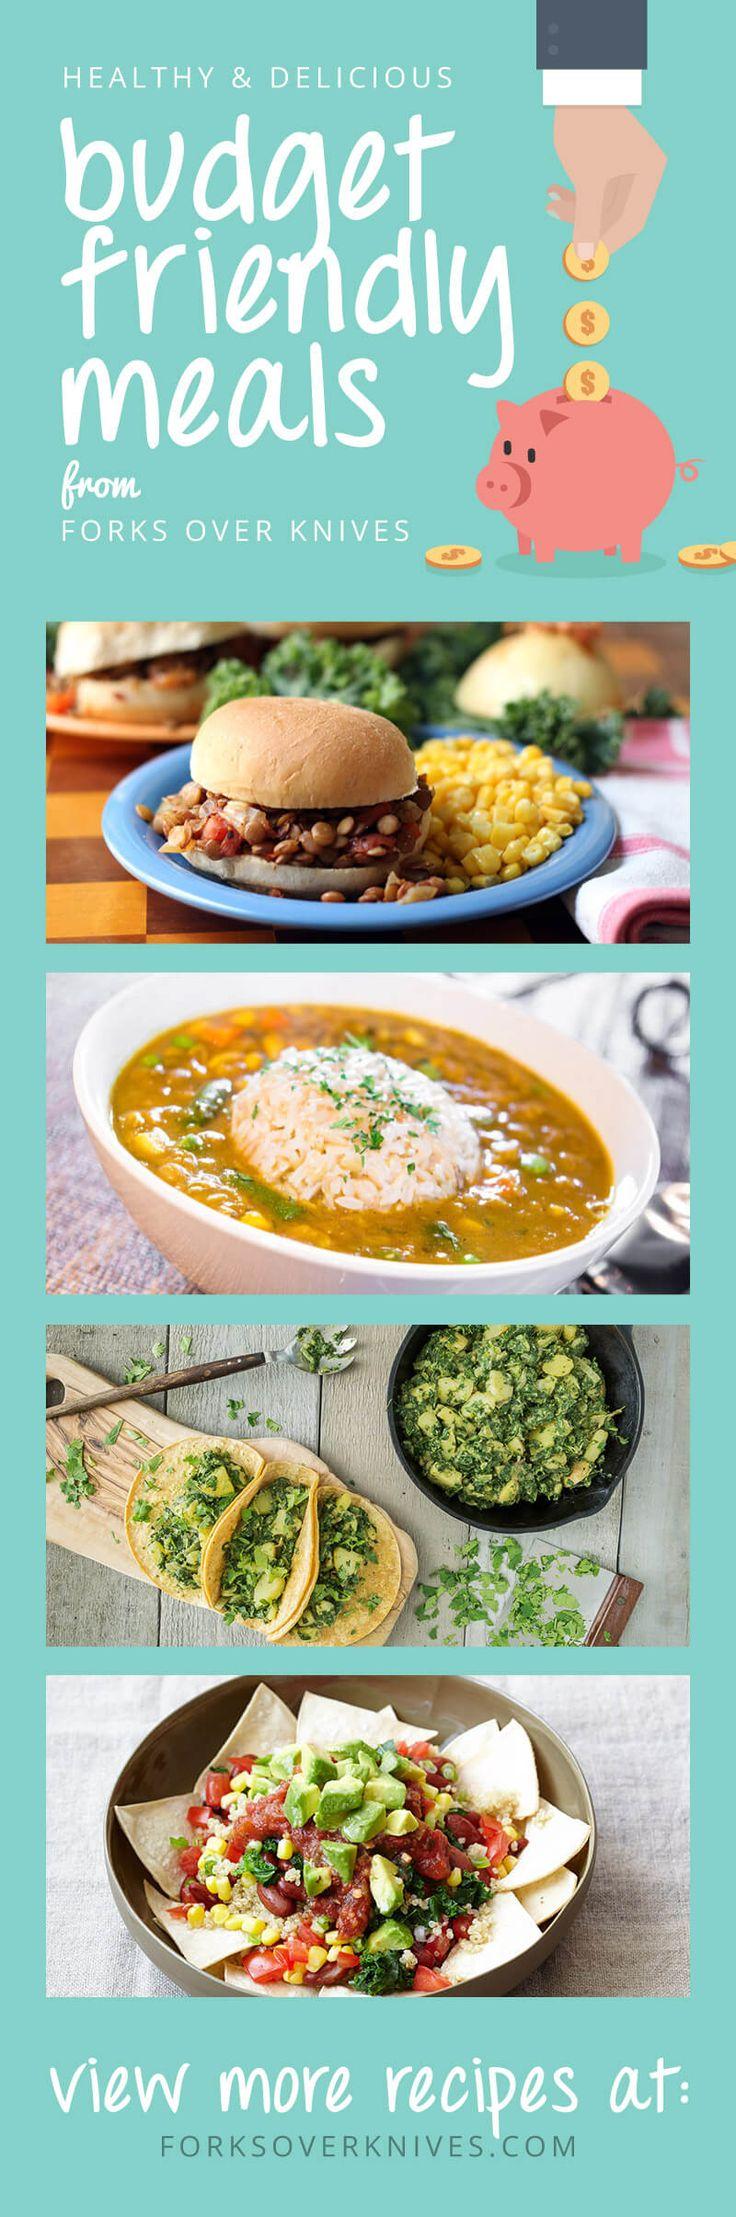 8 Budget-Friendly Meals - Forks Over Knives